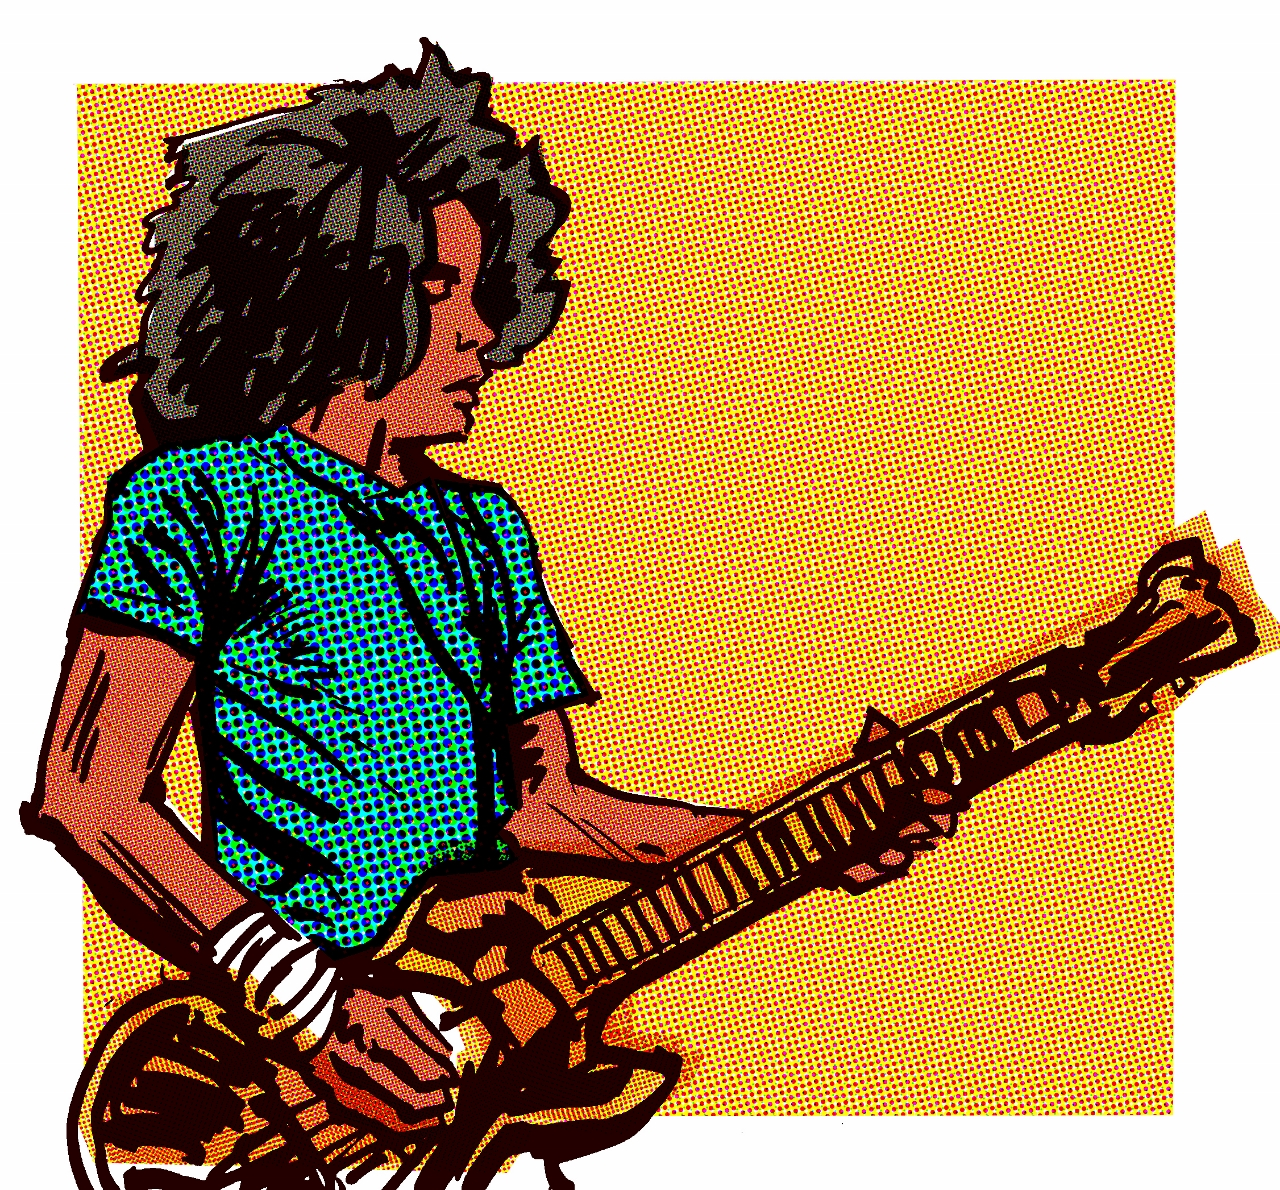 Brandon Bailey Johnson as illustrated by Oisin McGillion Hughes